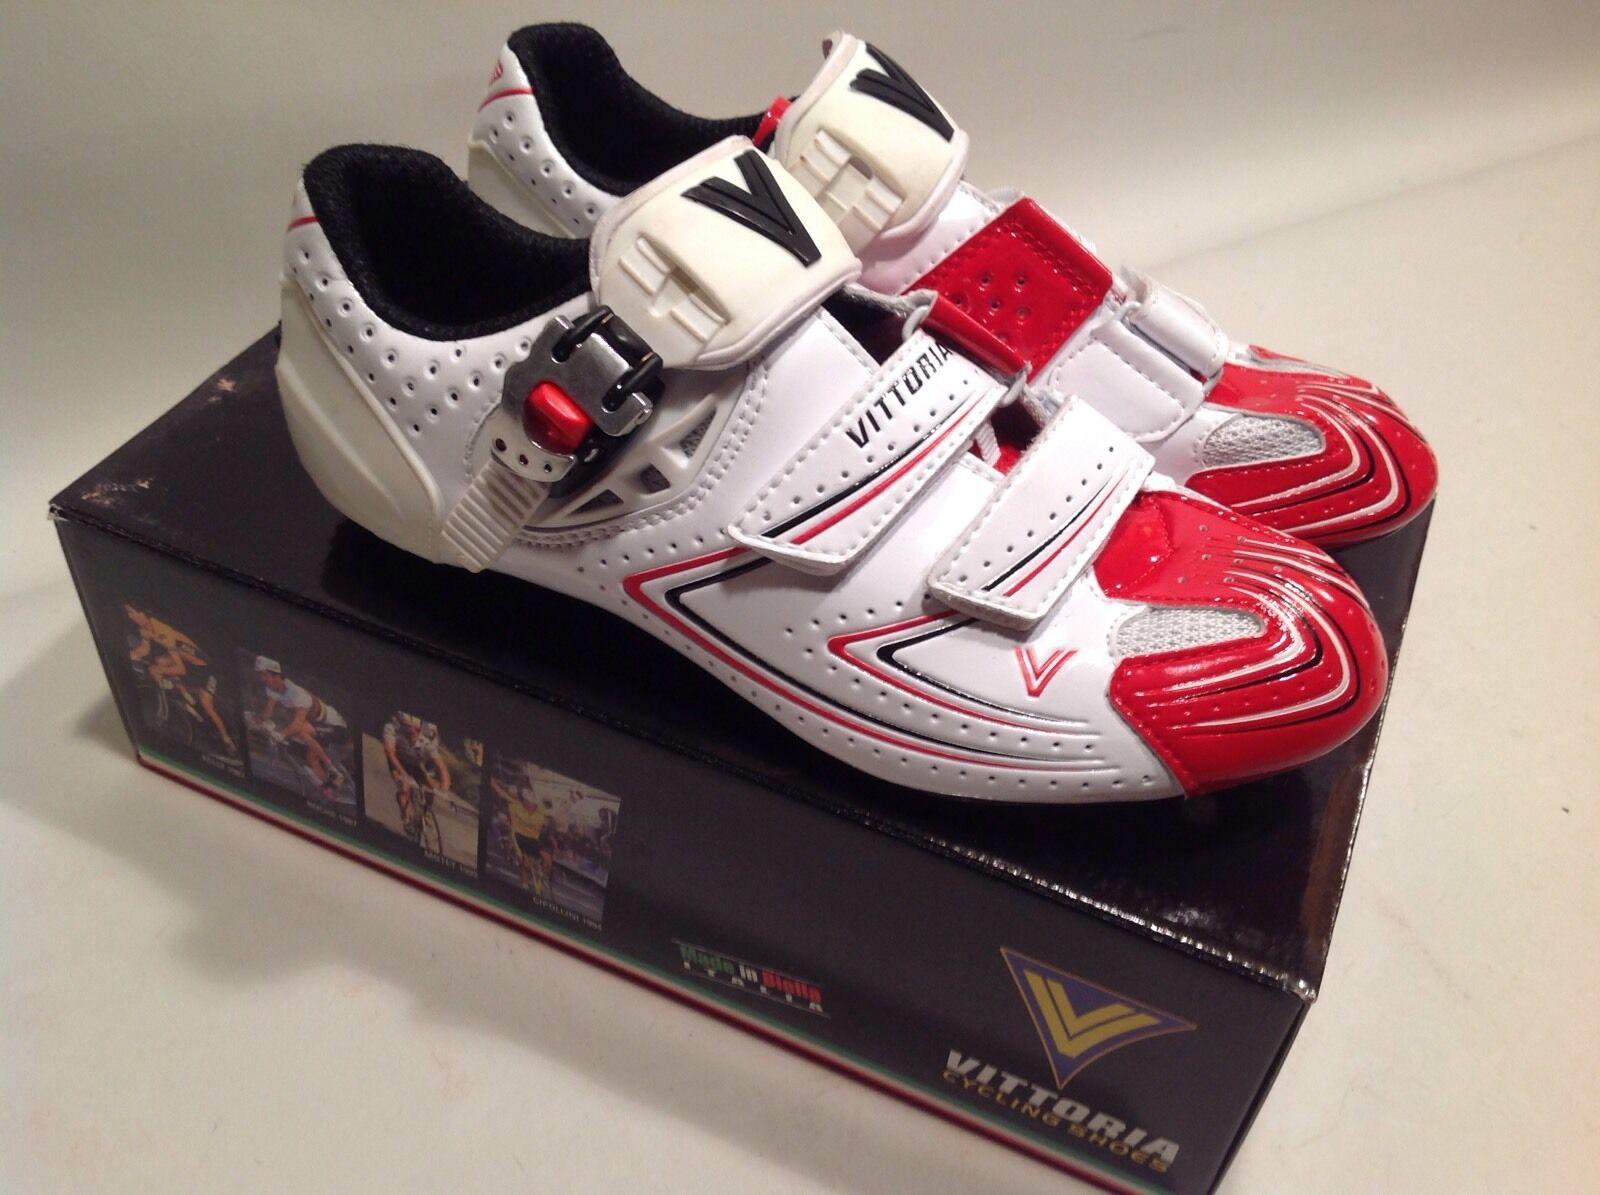 Vittoria VPro Carbon Road Cycling scarpe 40 EU 7.5 US biancarosso